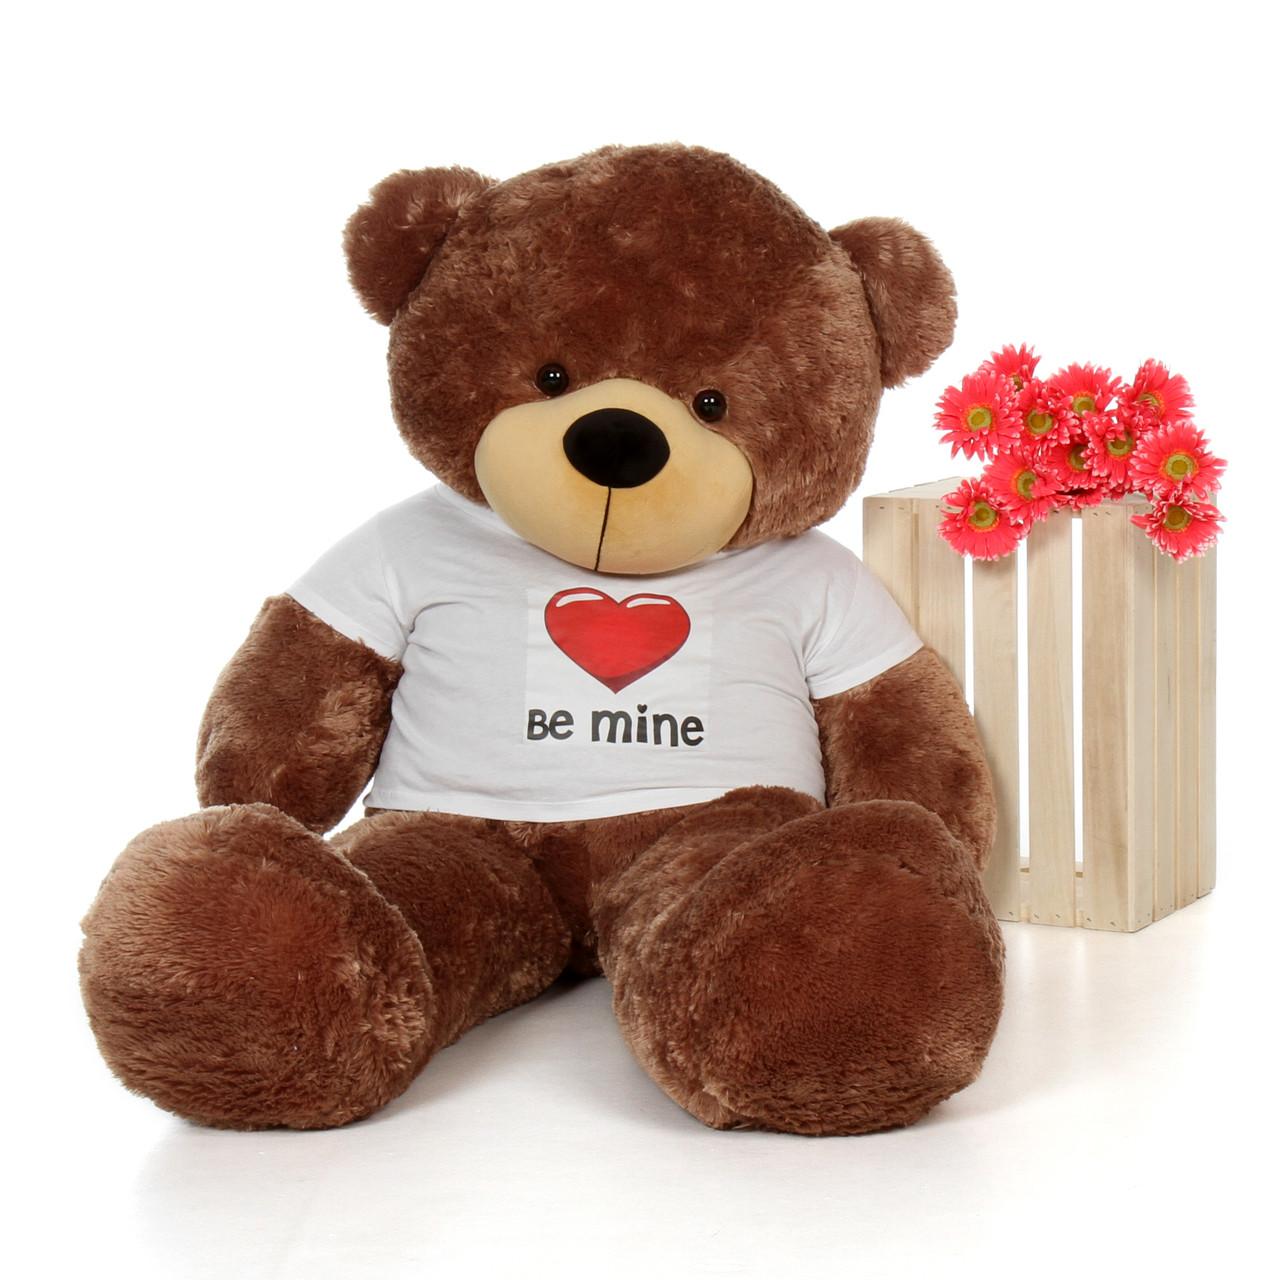 60in Mocha Brown Sunny Cuddles Giant Teddy Bear in Be Mine T-Shirt